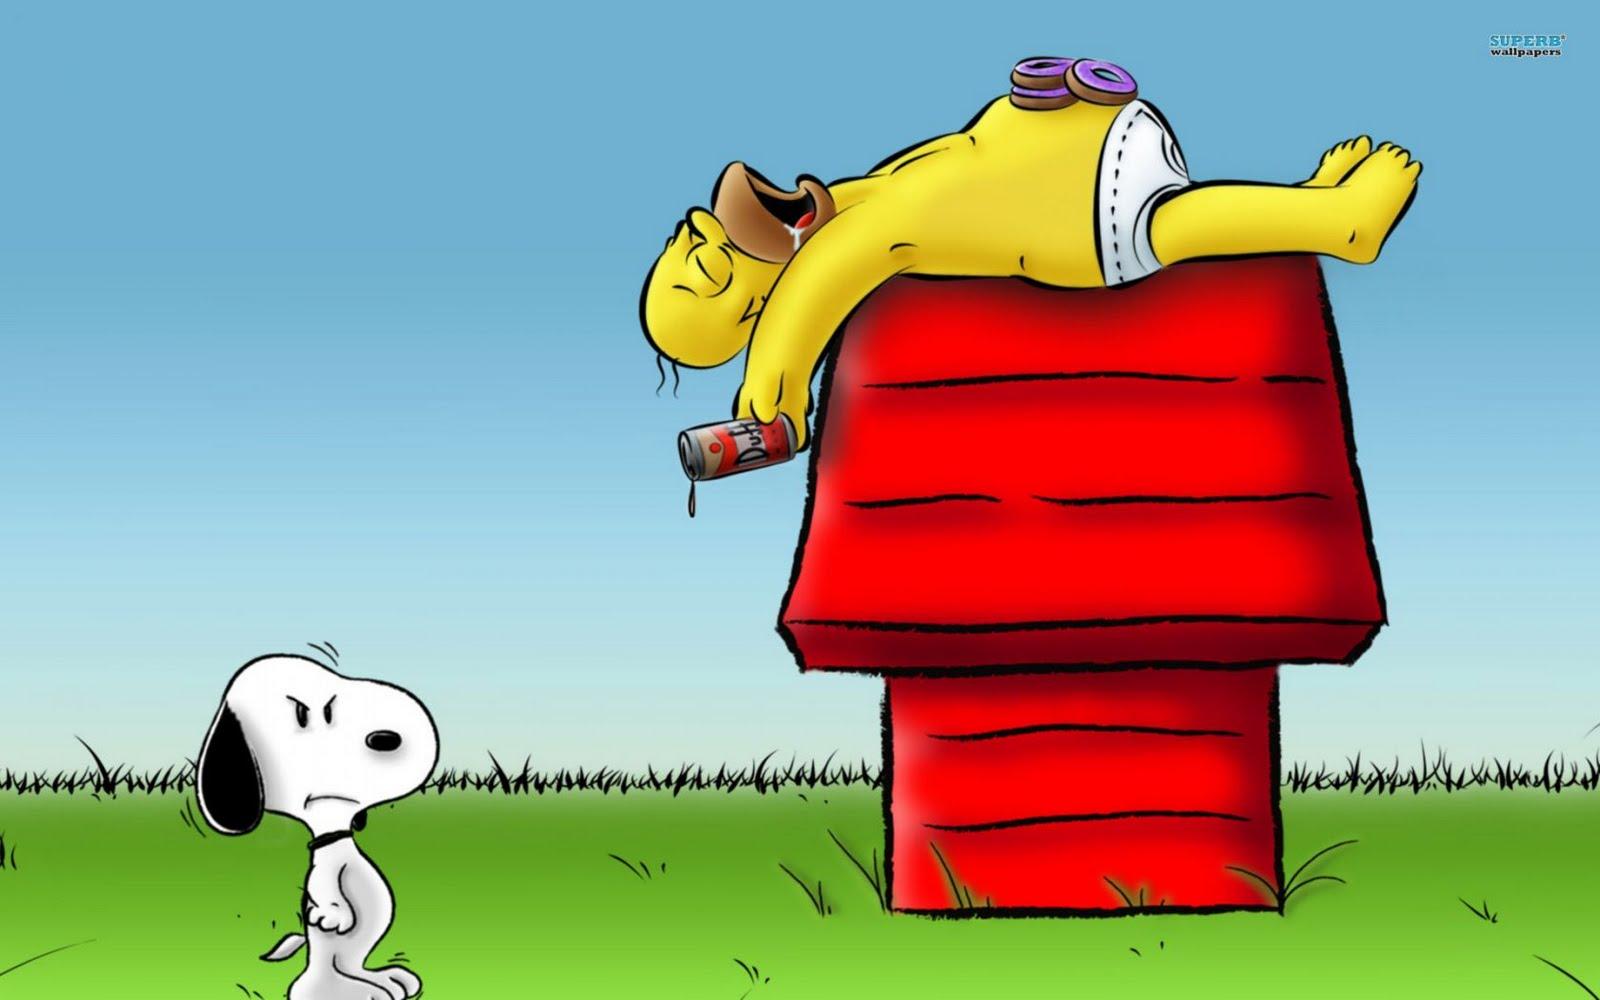 Snoopy peanuts desktop wallpaper Picture amp Wallpaper 1600x1000